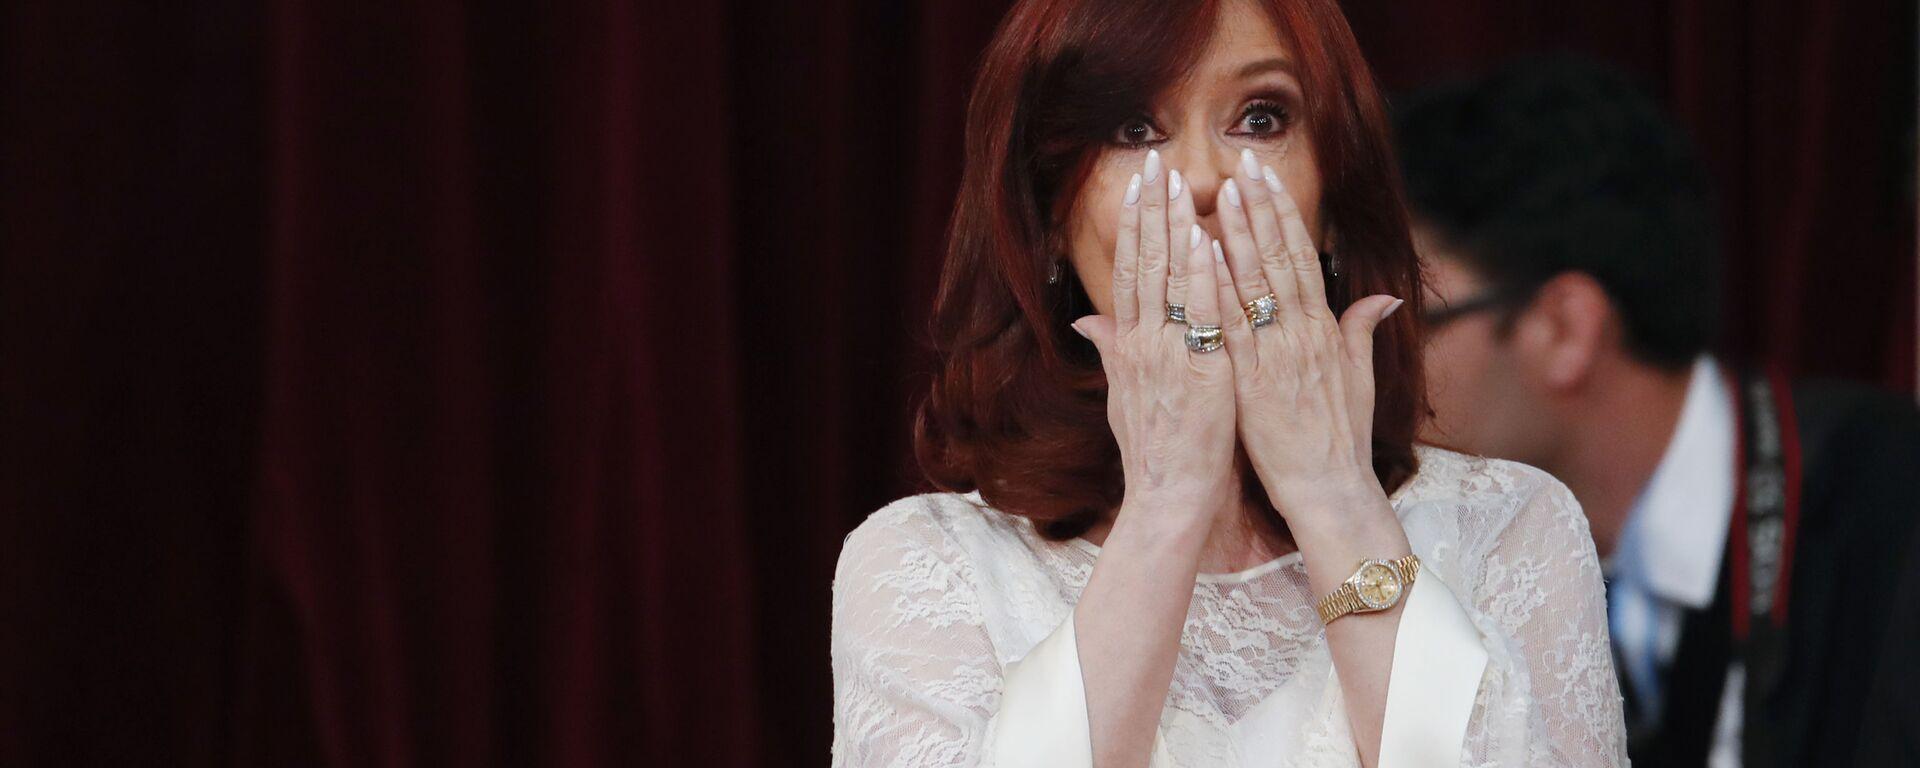 Cristina Fernández de Kirchner - Sputnik Mundo, 1920, 18.08.2021